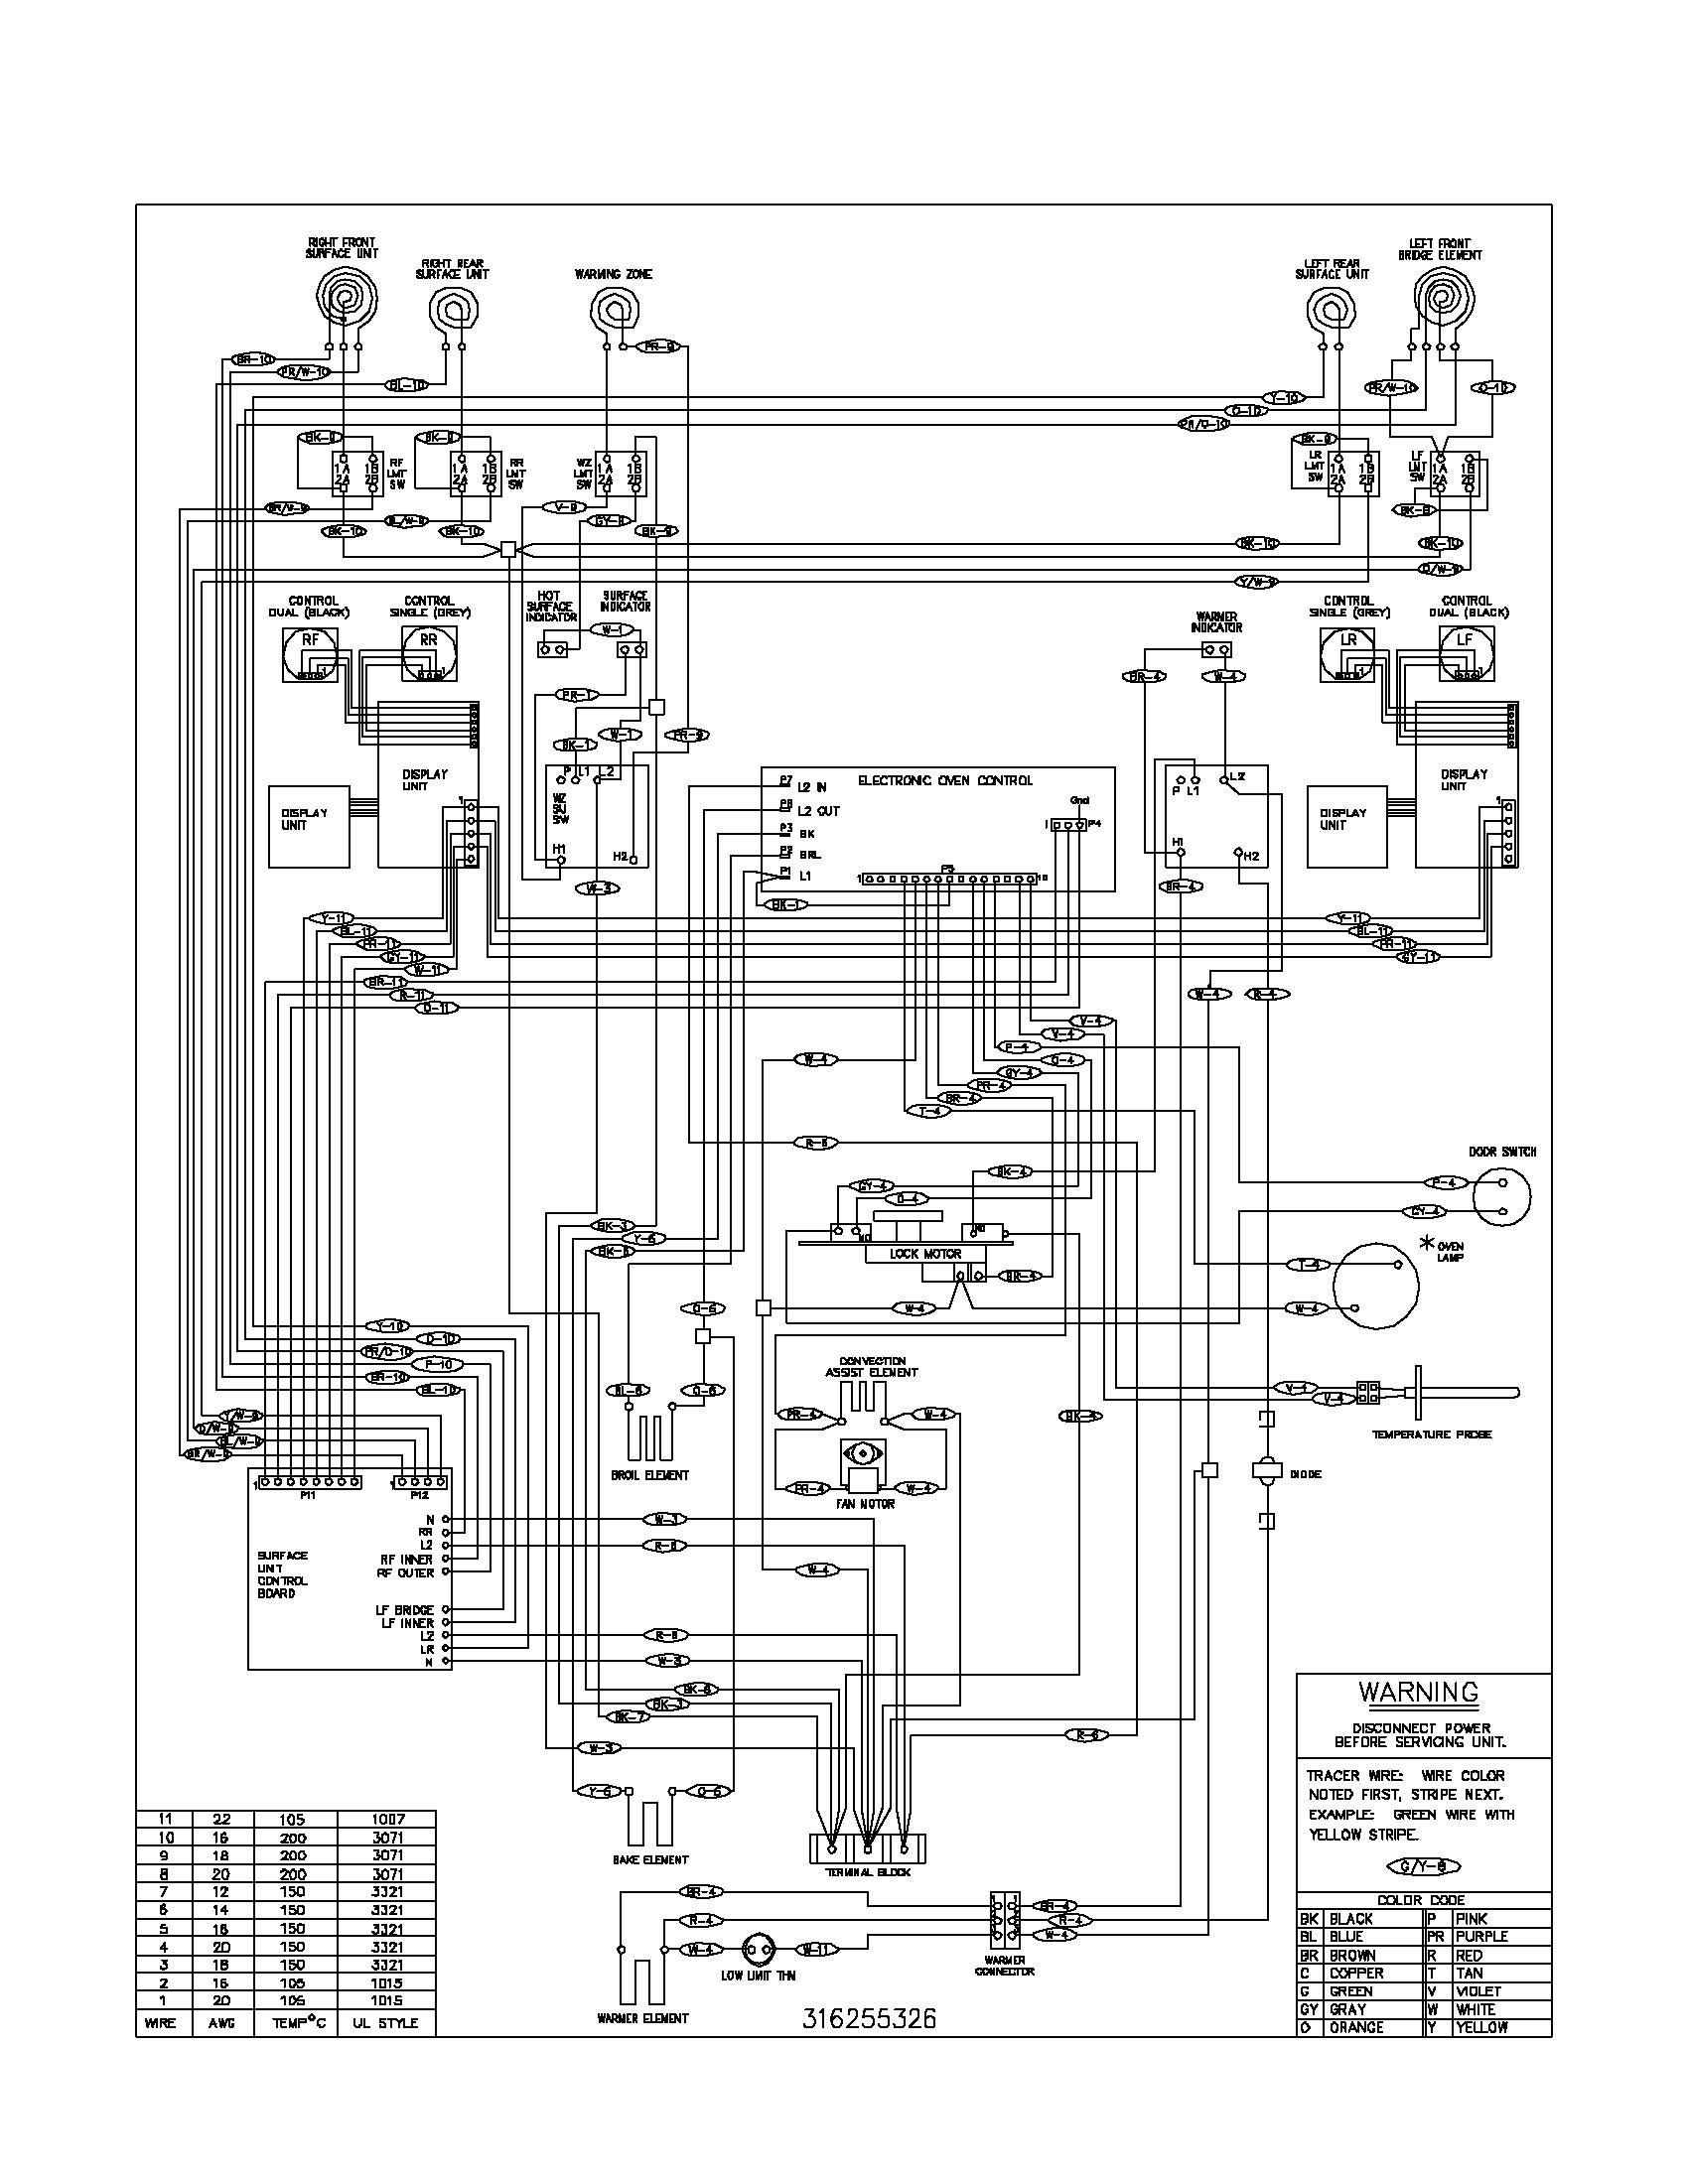 Intertherm Electric Furnace Wiring Diagram Unique nordyne E2eb 015hb thermostat Wiring Diagram Model E2eb 015hb Elsavadorla